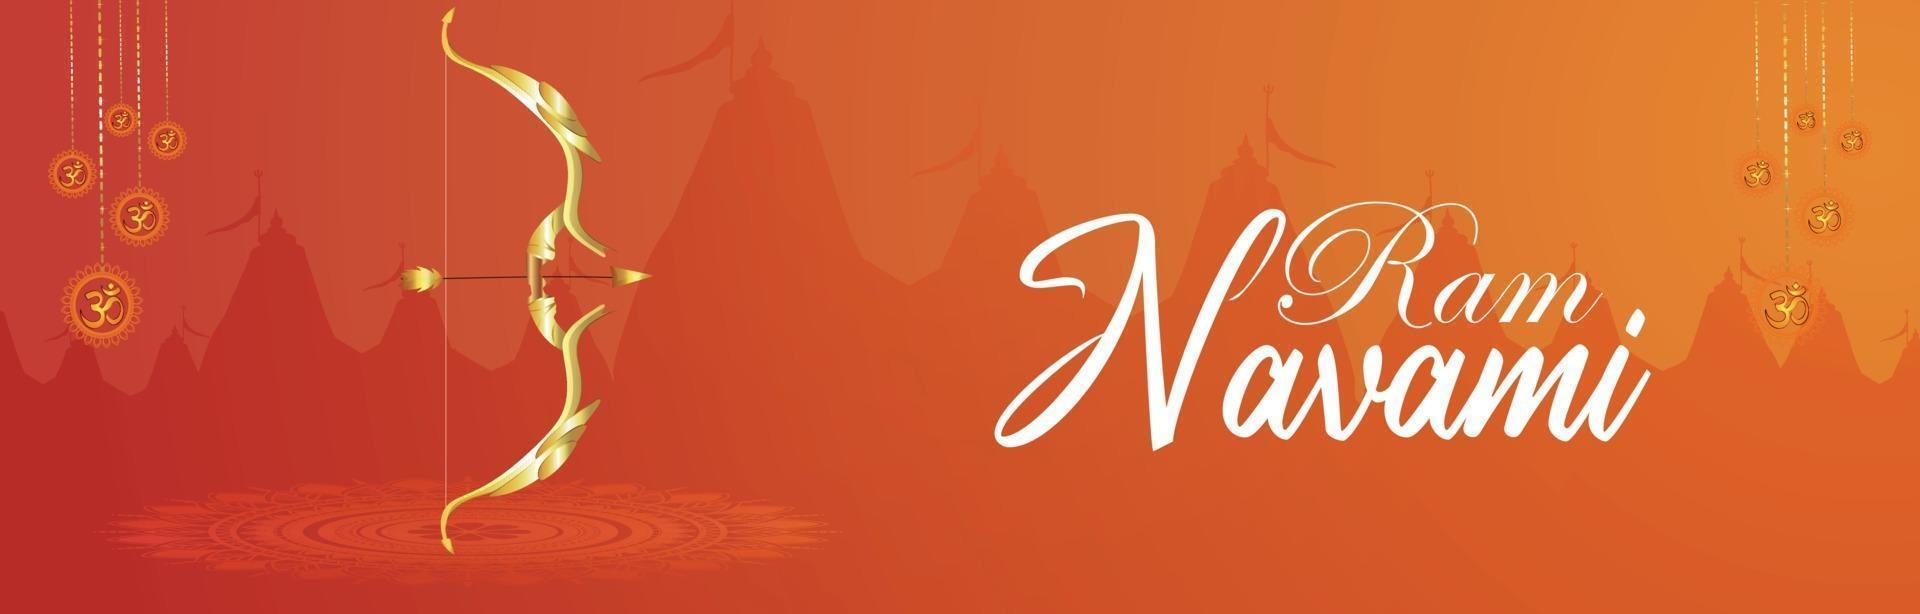 kreativ banner av lycklig ram navami med kreativ illustration vektor